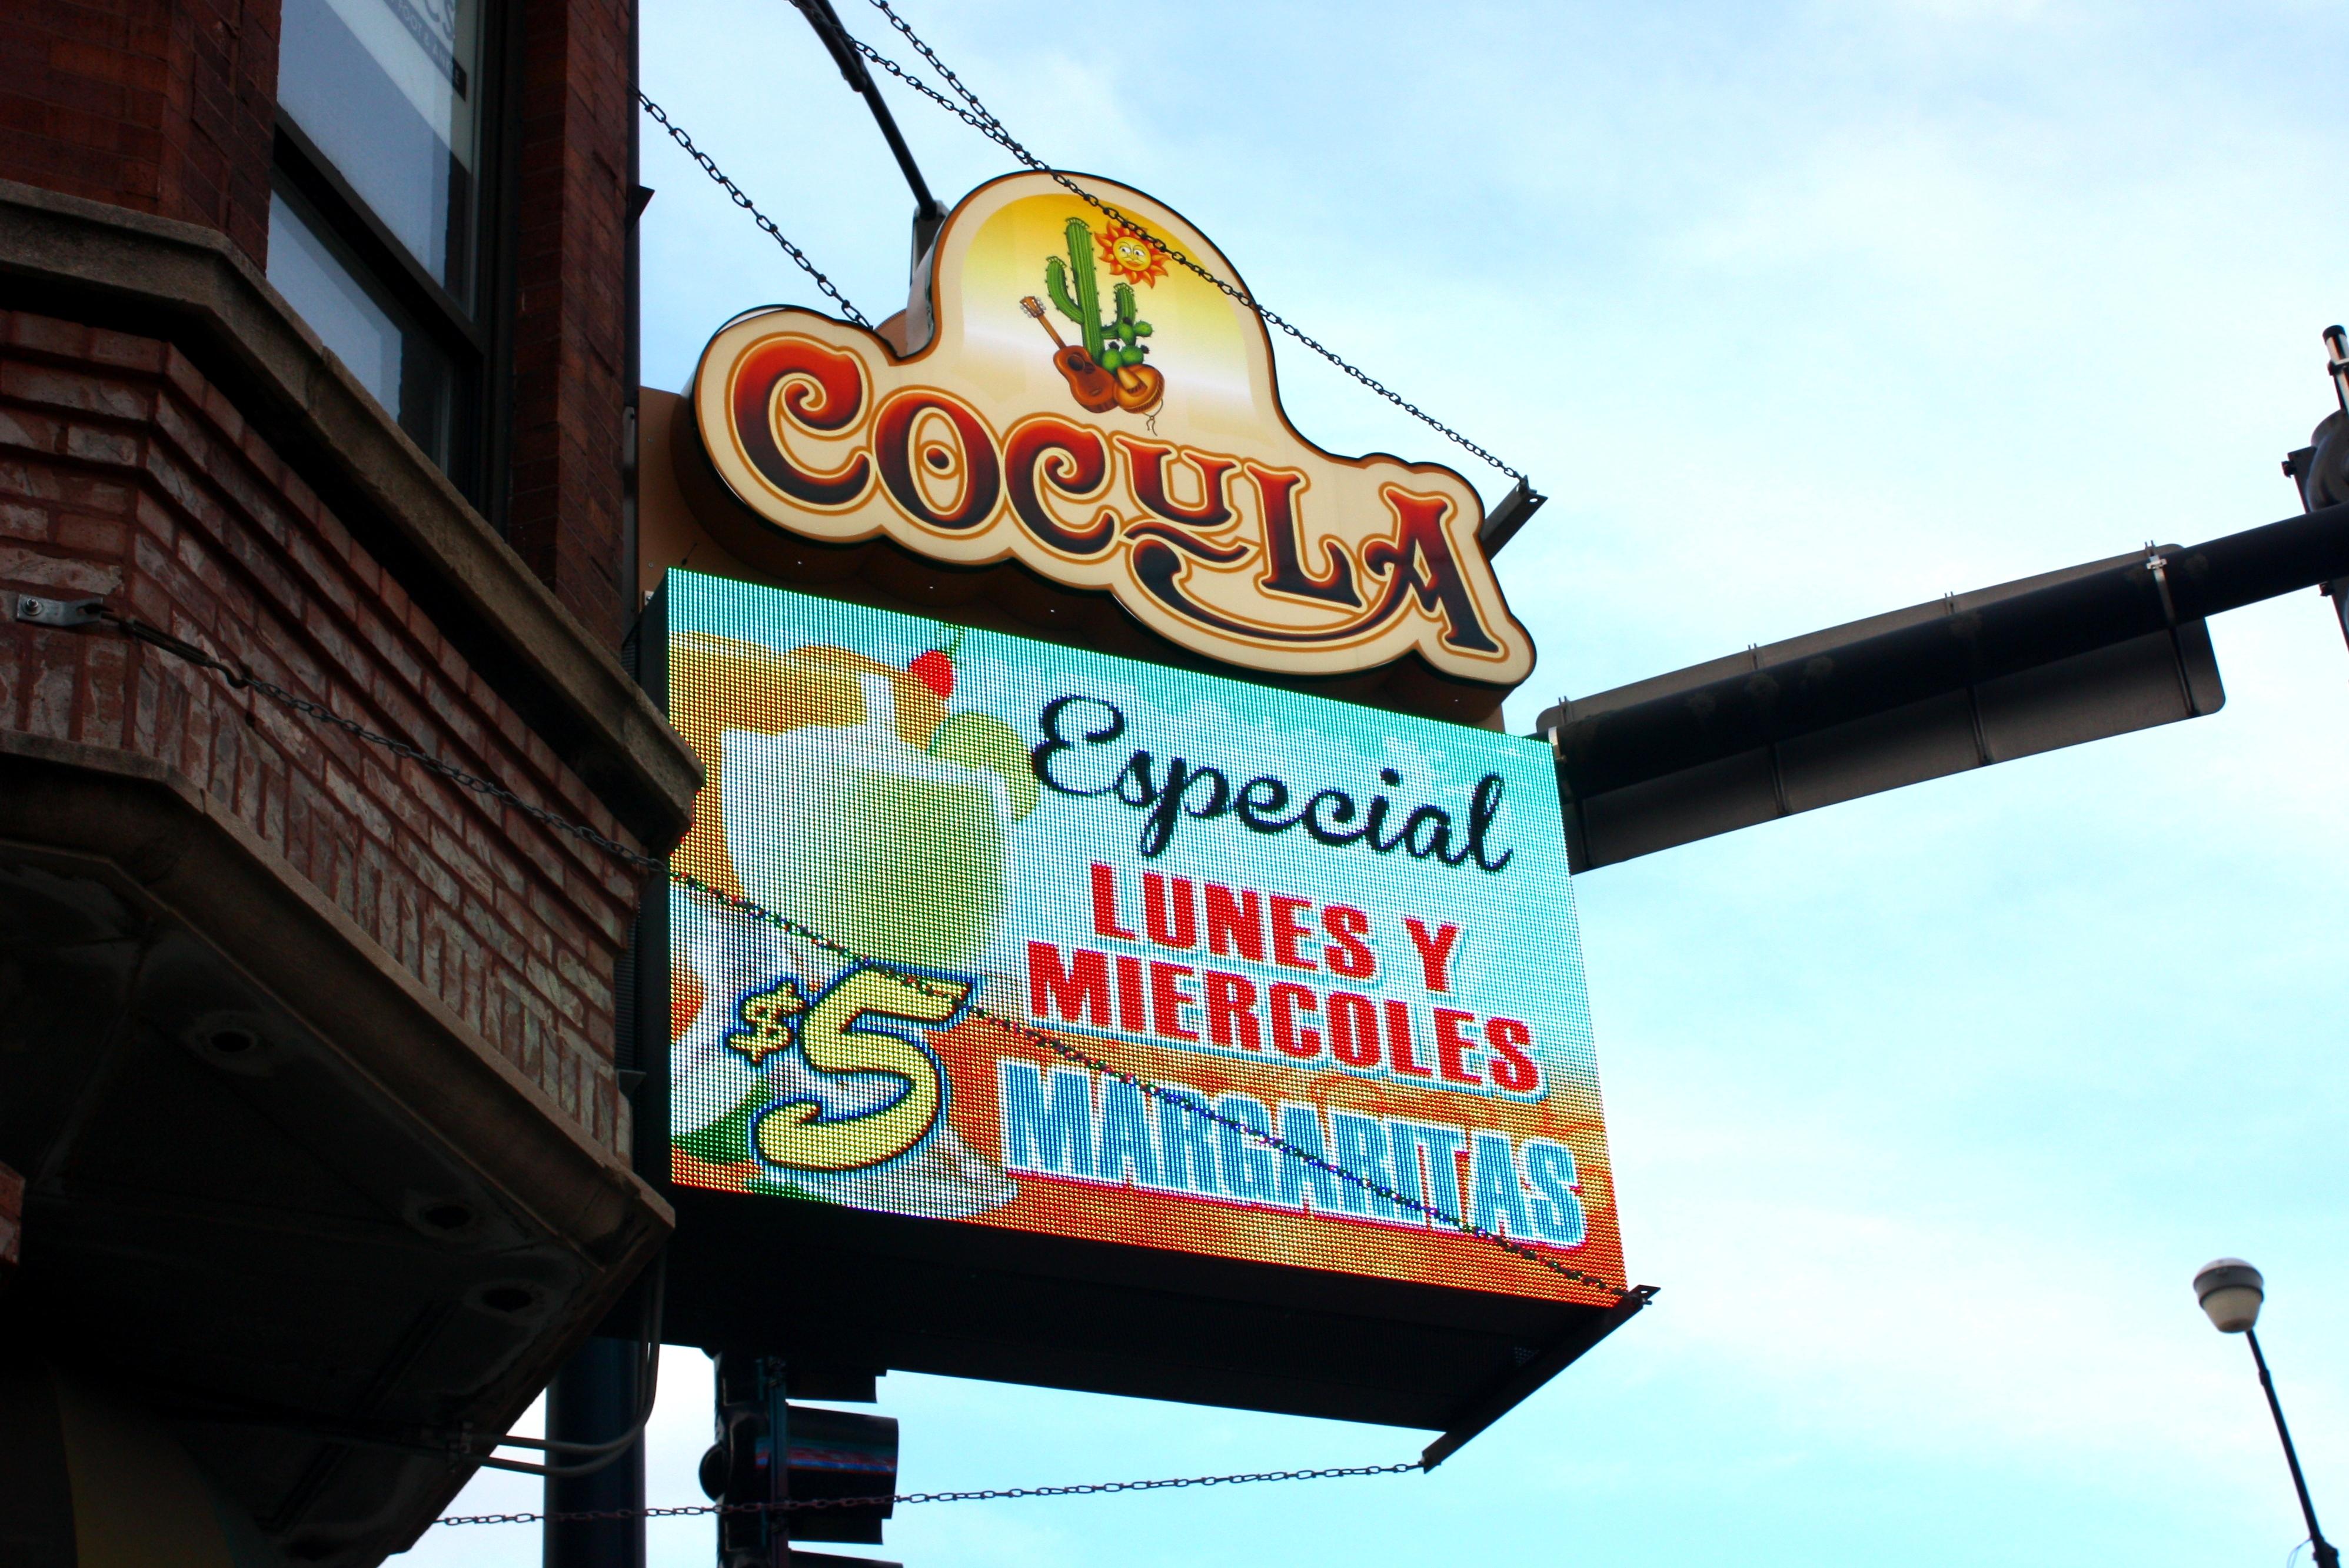 Cocula_1